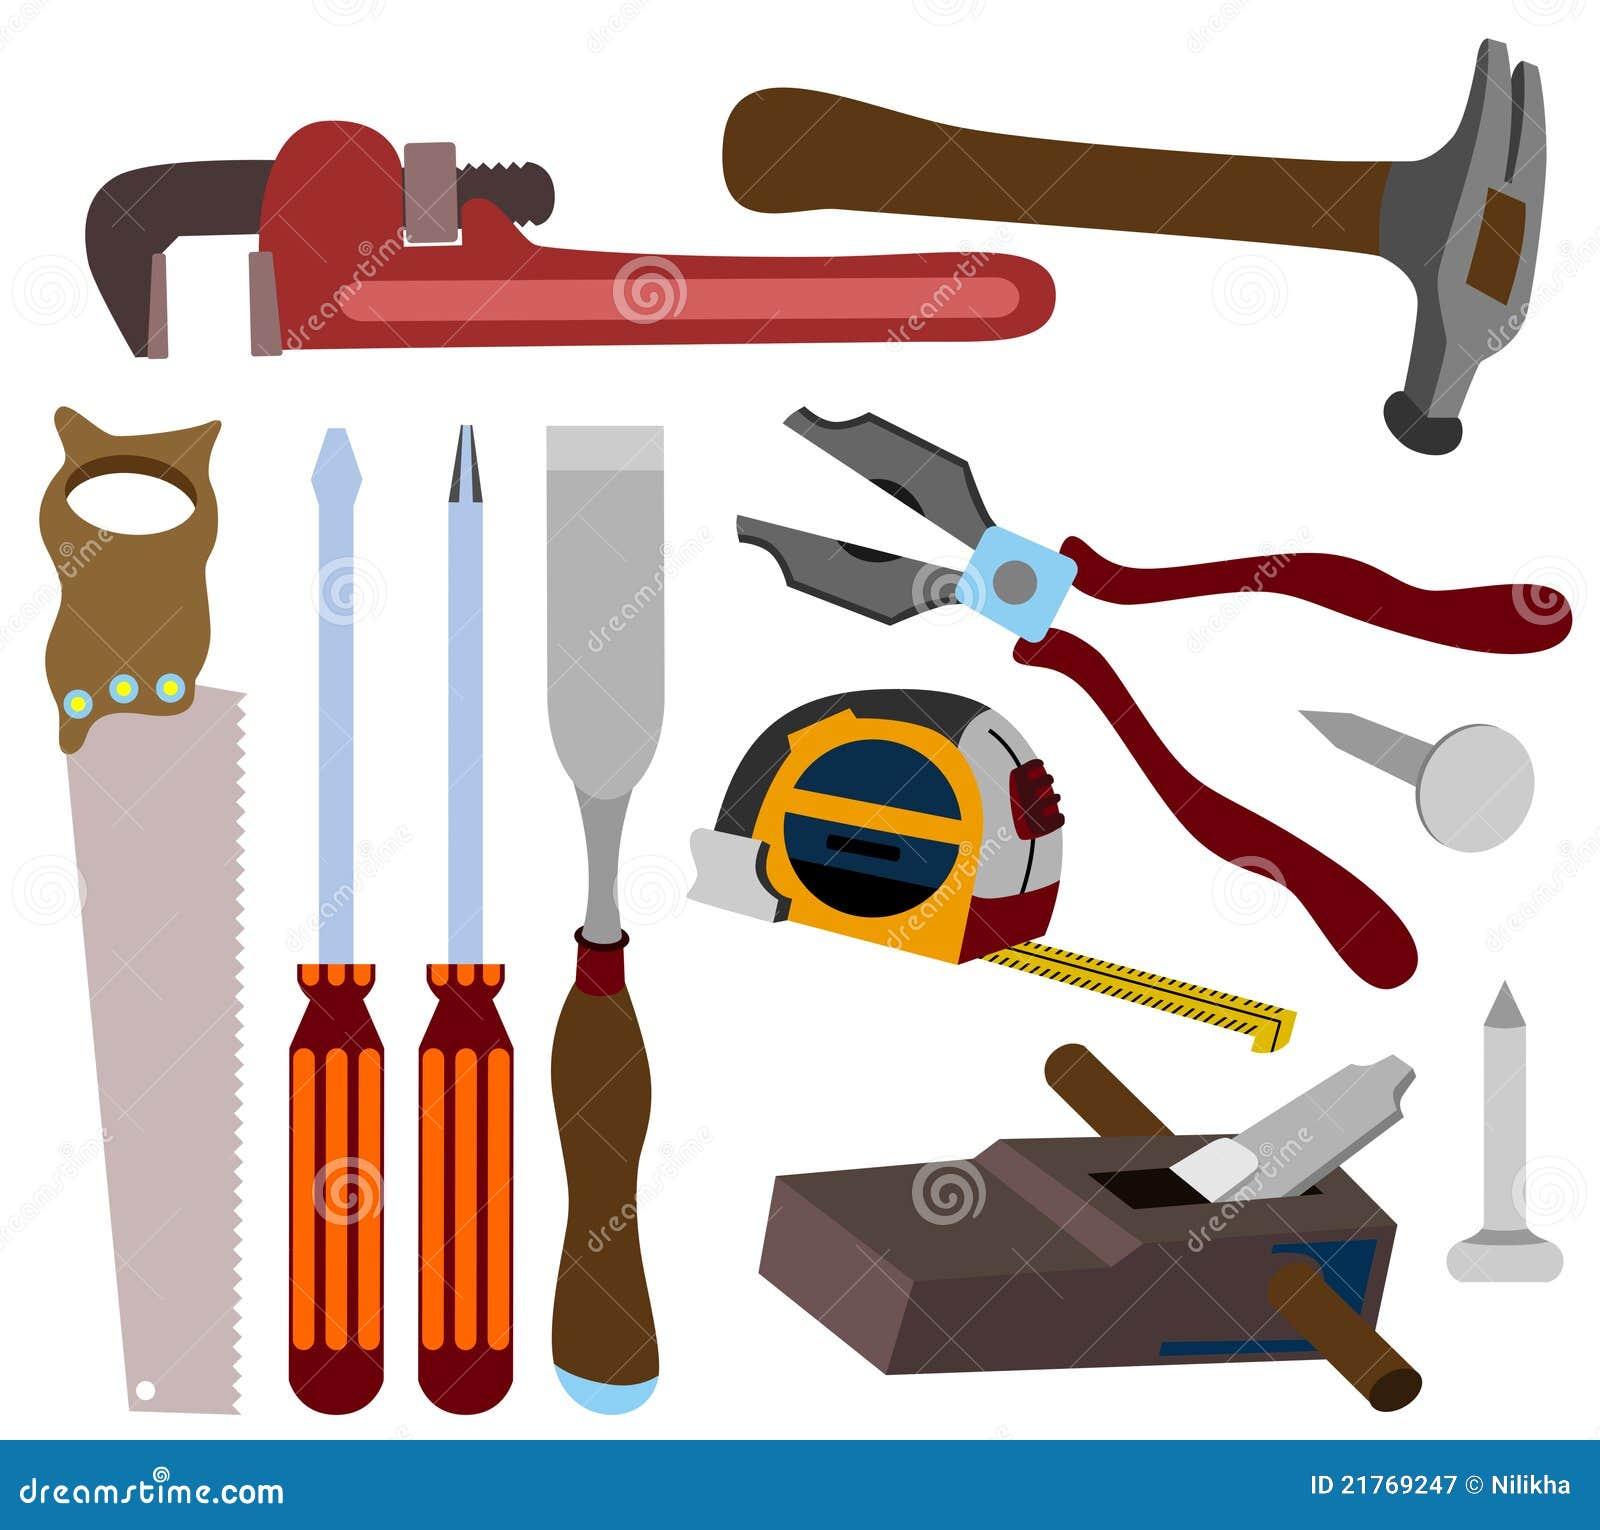 Carpenter tools stock illustration. Image of nail ...